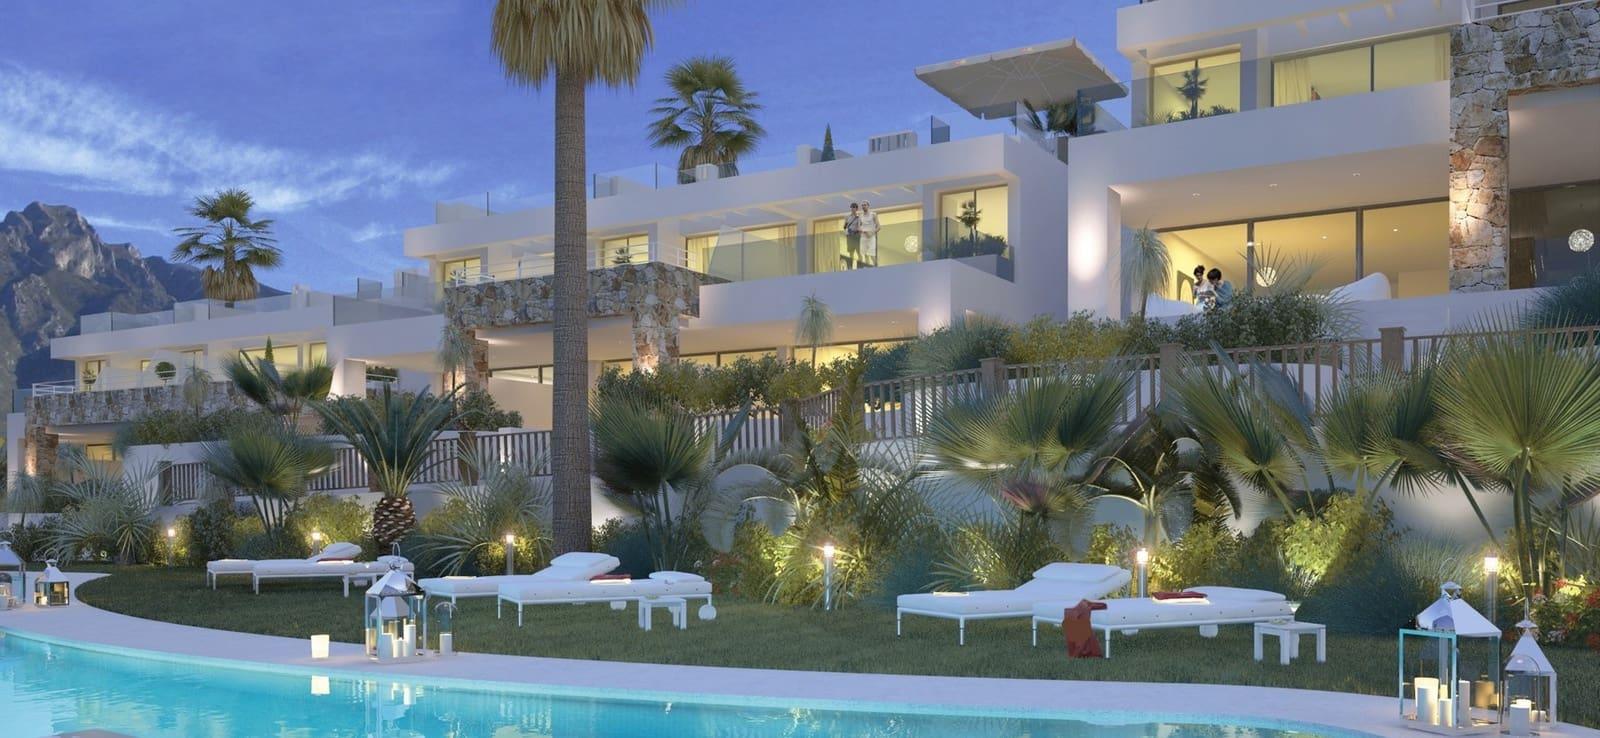 3 chambre Bungalow à vendre à Marbella avec piscine - 835 000 € (Ref: 5402112)